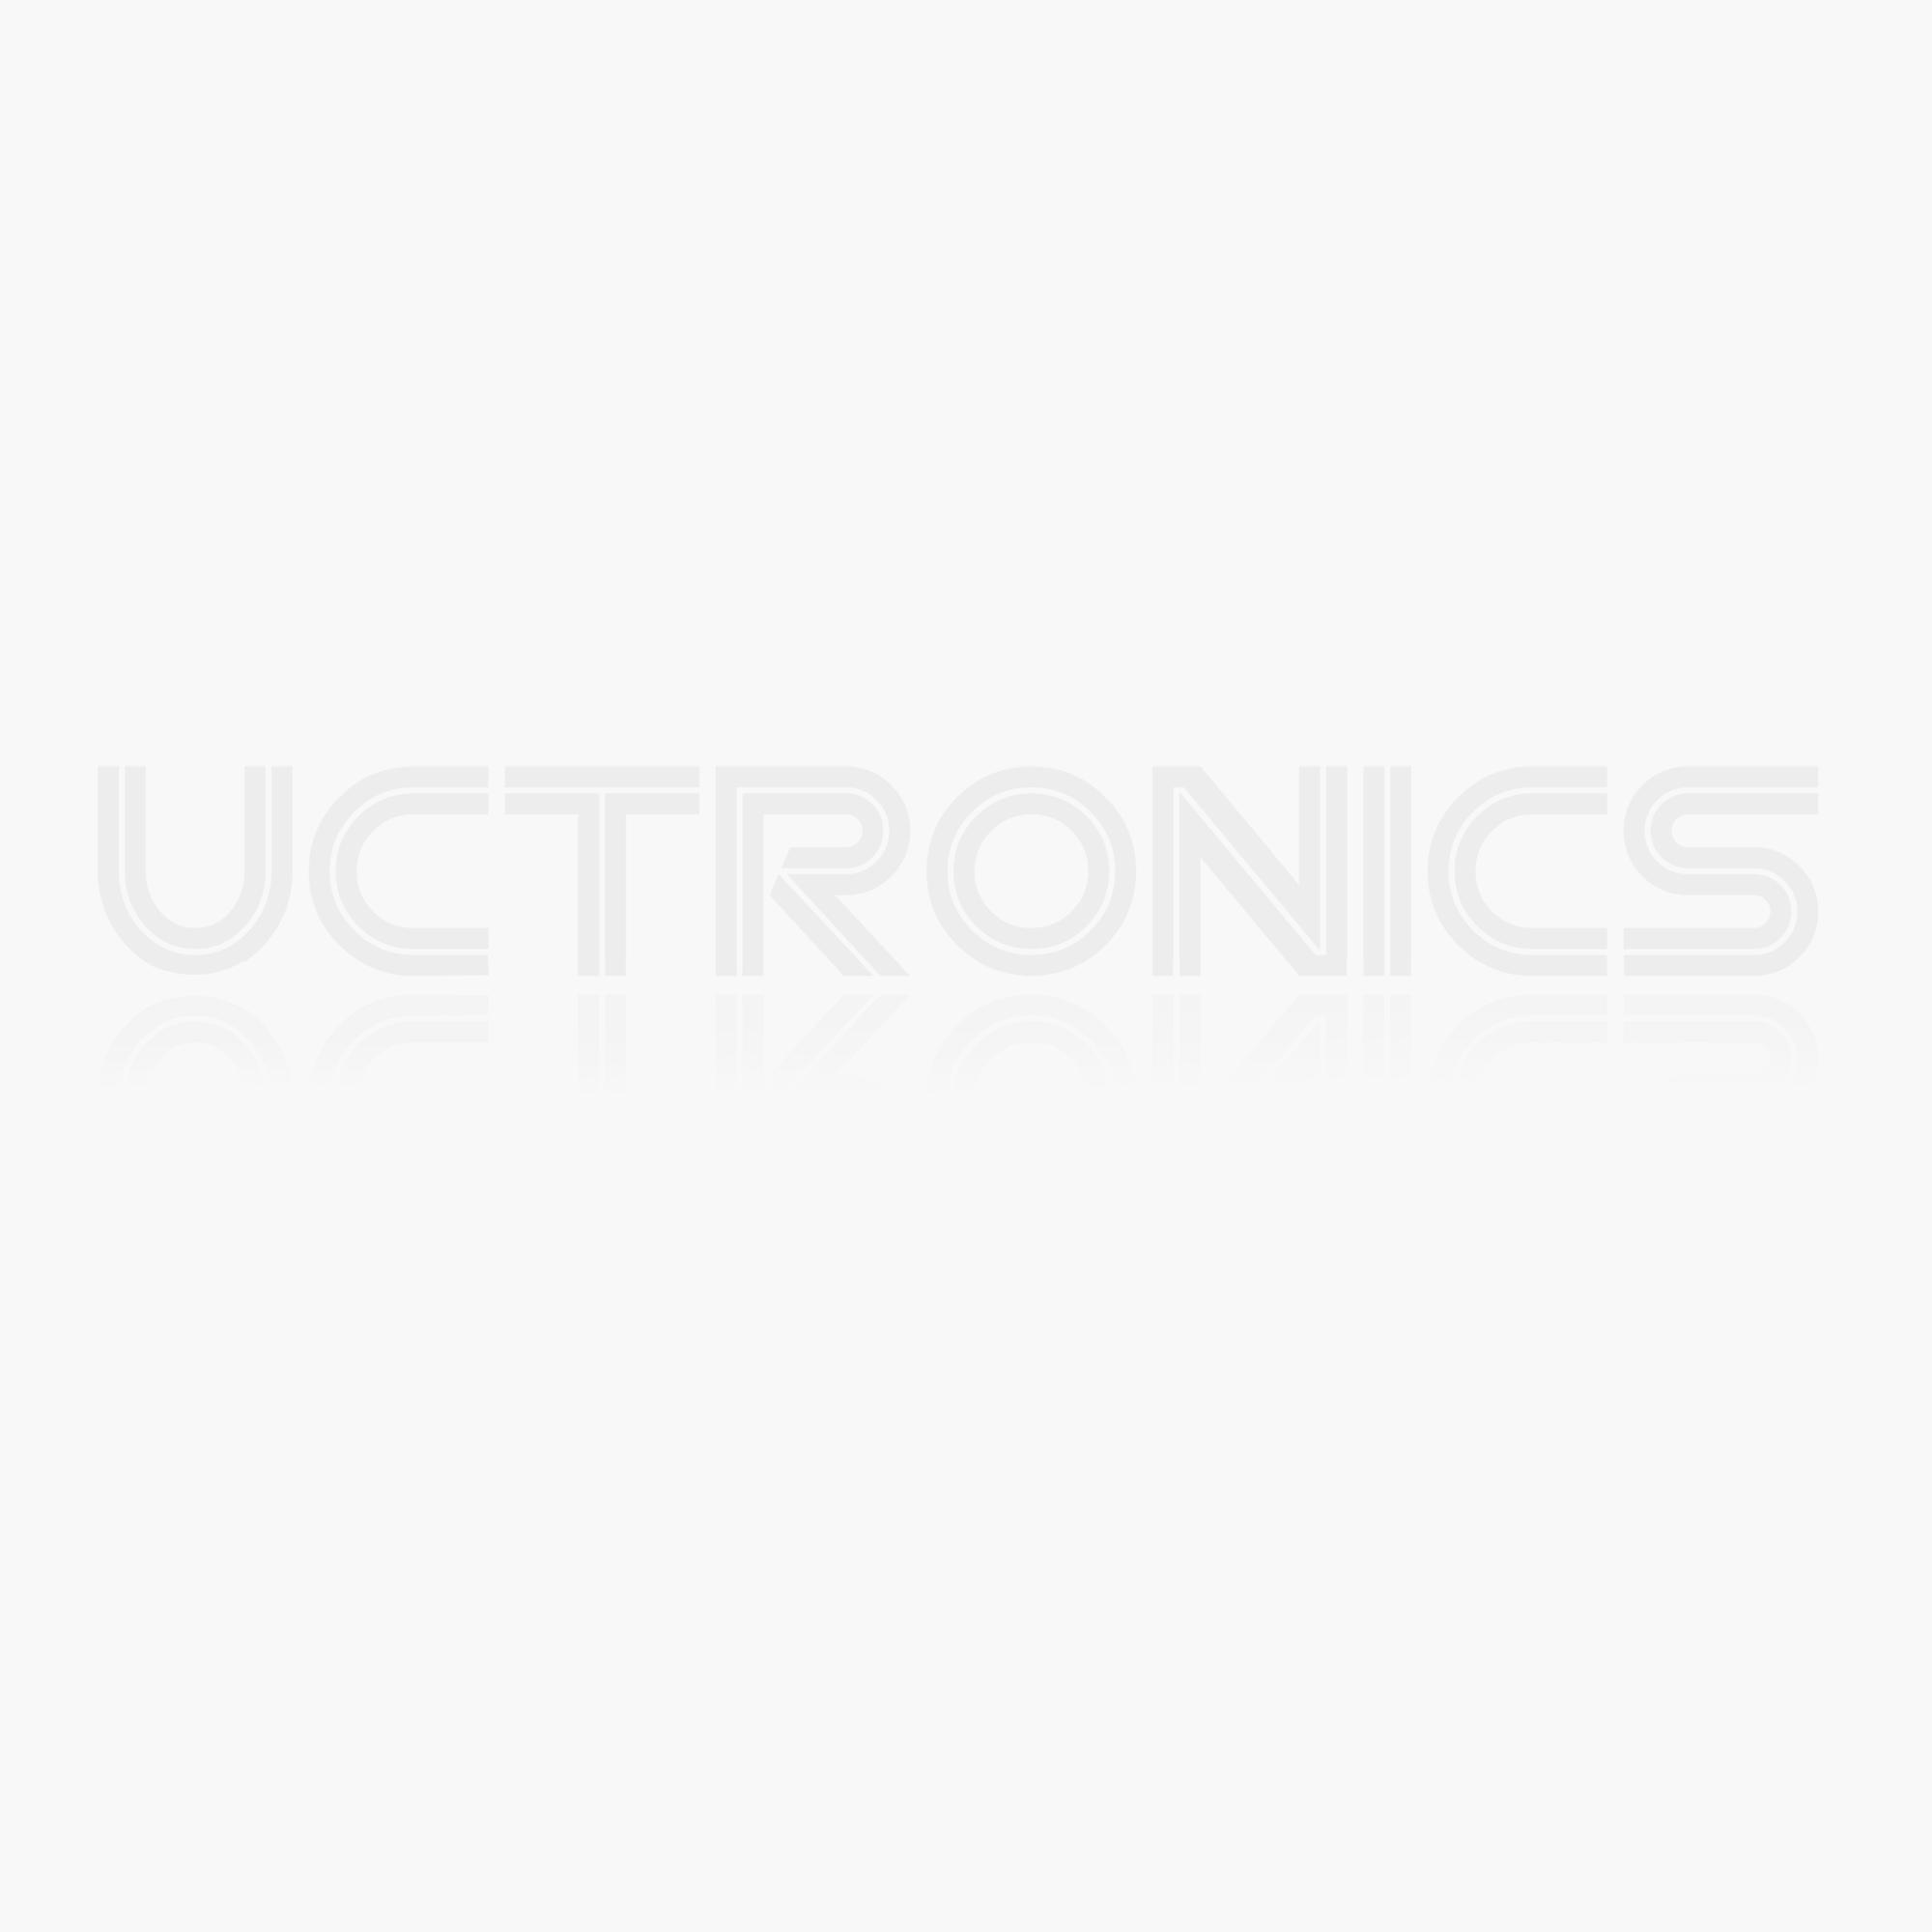 2004 20x4 2004A Yellow Character LCD Display /w IIC/I2C Serial Interface Adapter Board